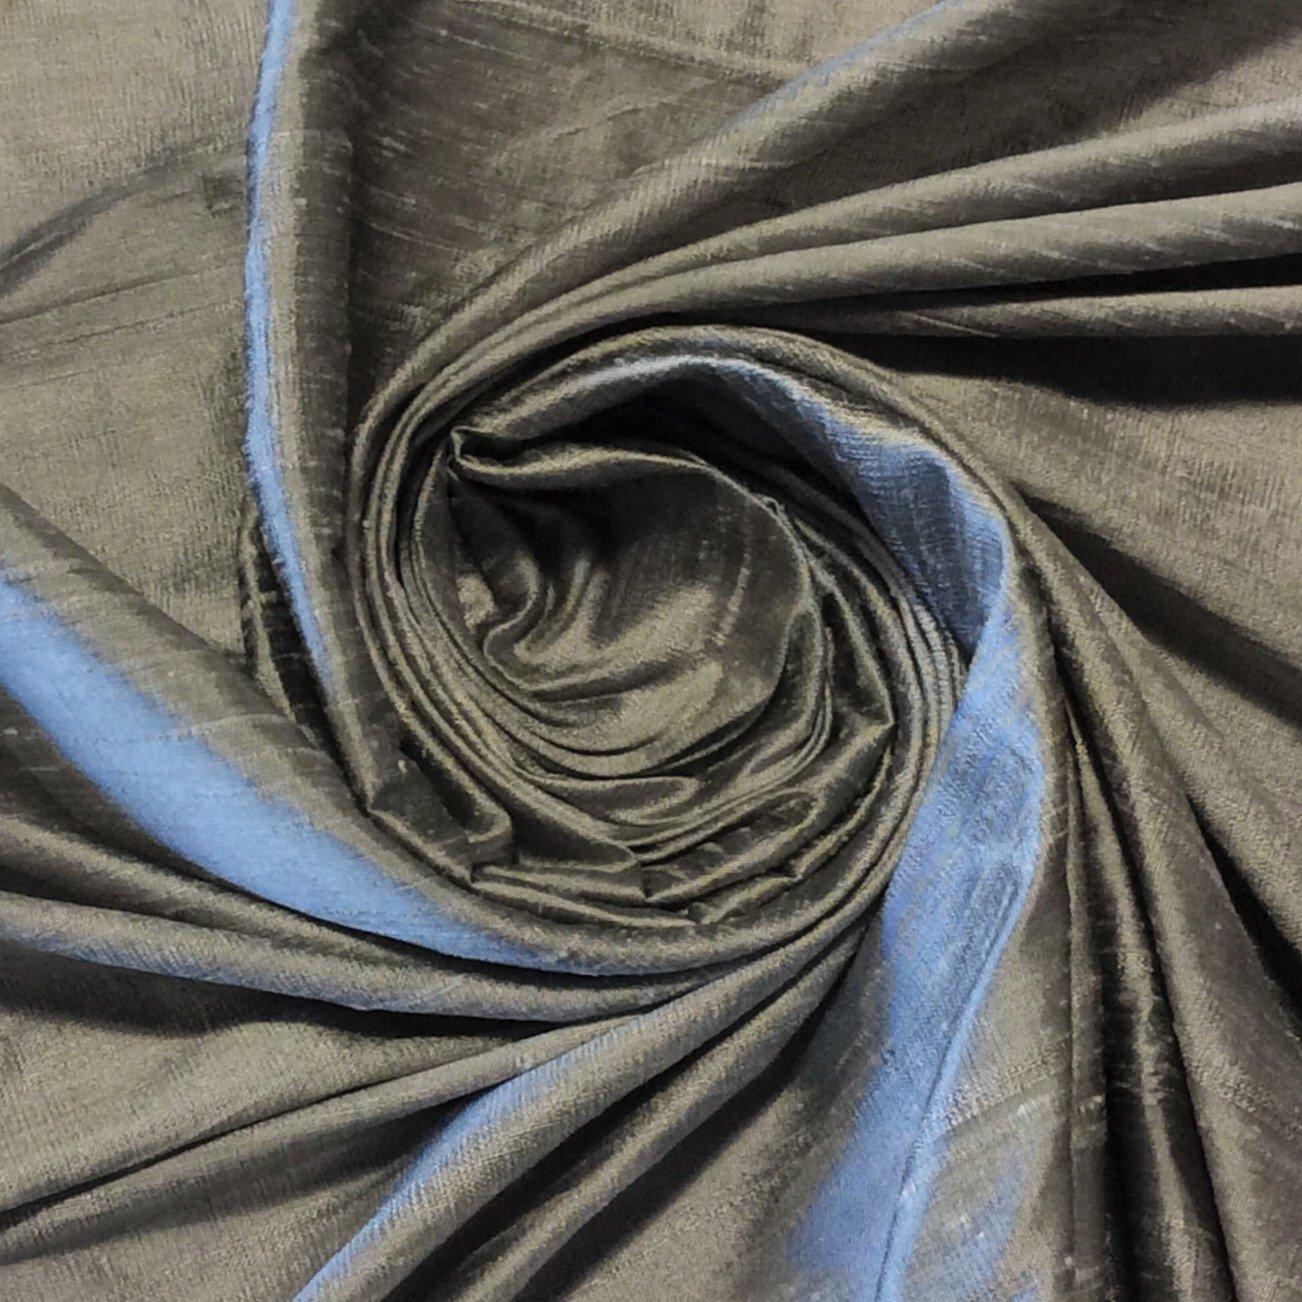 SILK SHW25 Exquisite Hand Woven Dupioni 100% Silk Fabric Drapery Fabric BTY Silver